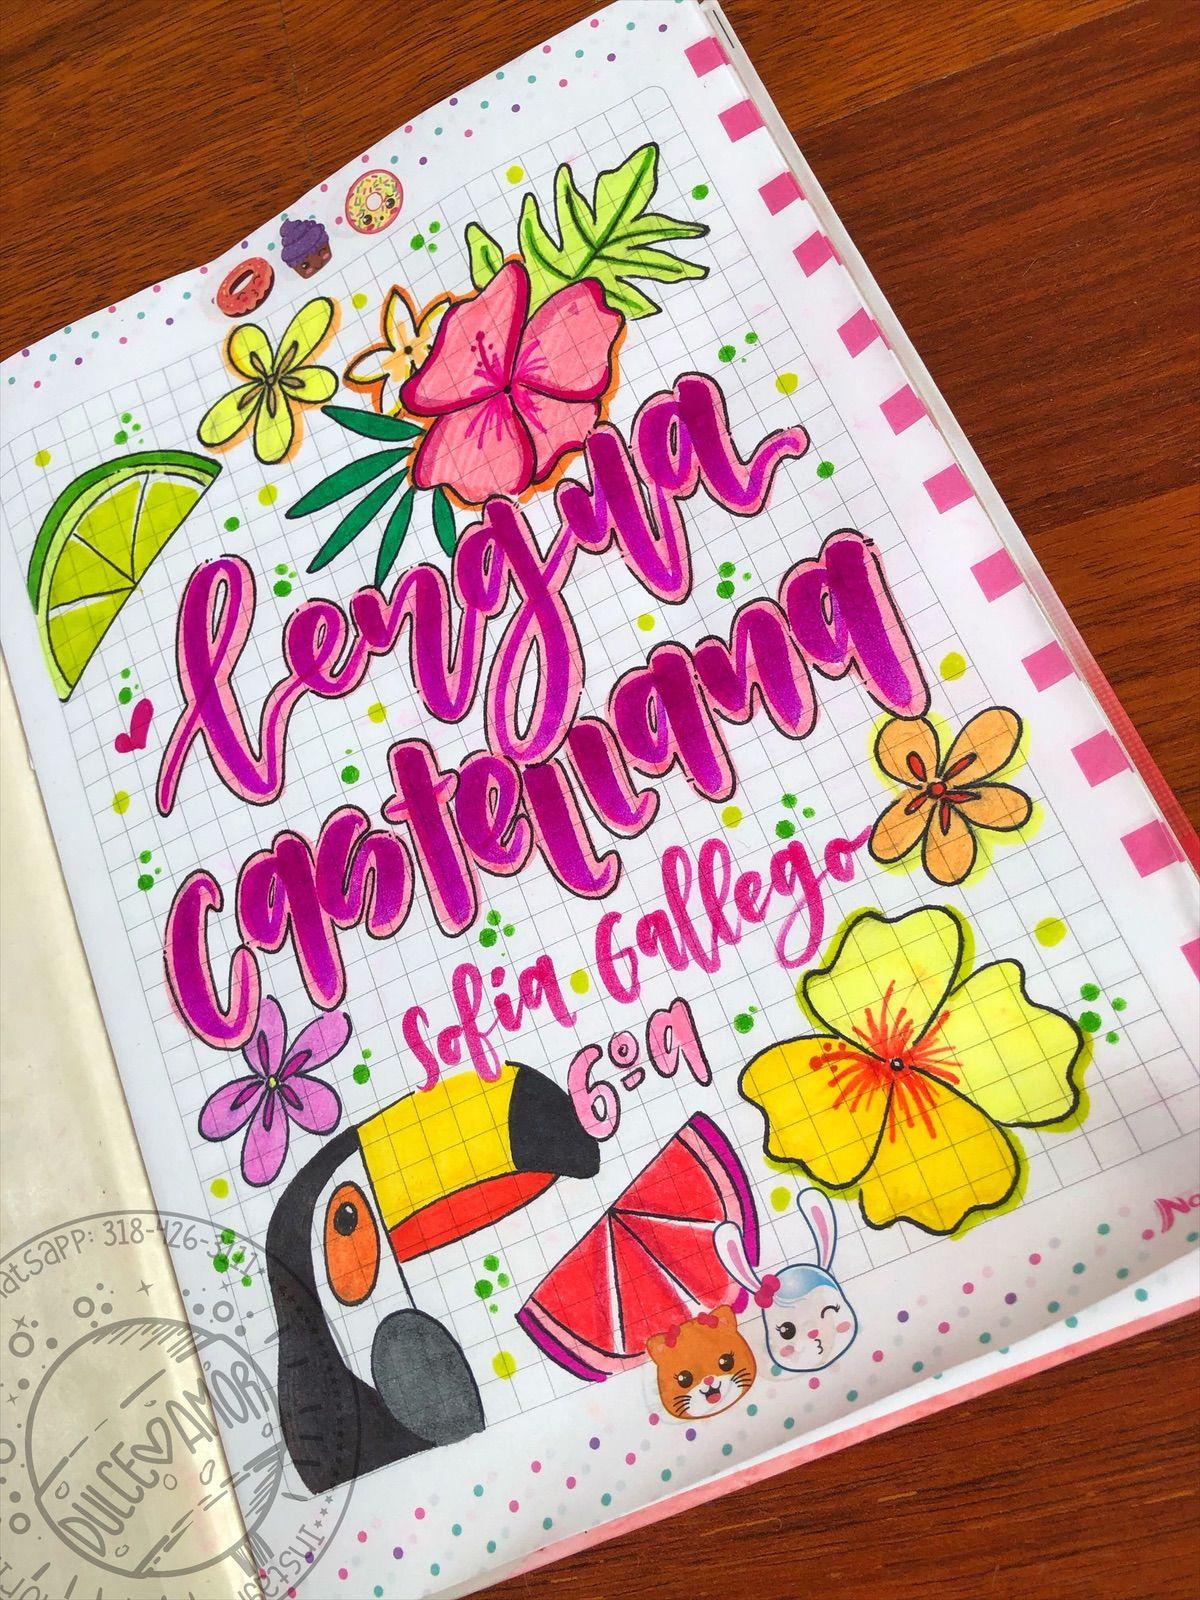 Marcamos Tus Cuadernos At Dulceamor17 Pereira Marcas De